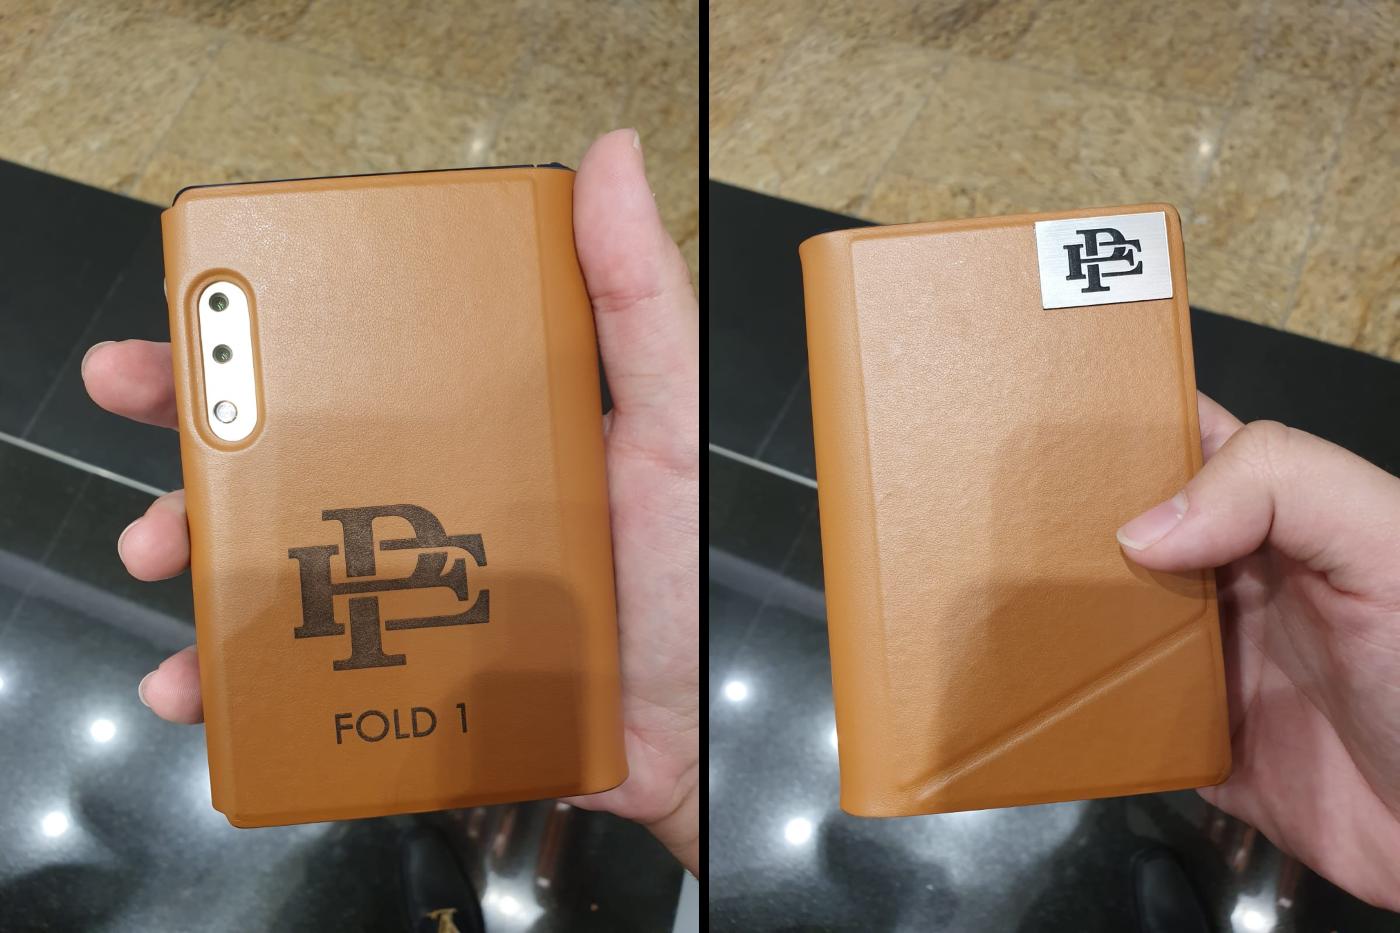 Escobar Fold 1 Foldable Phone - Outer Side & Dual Cameras